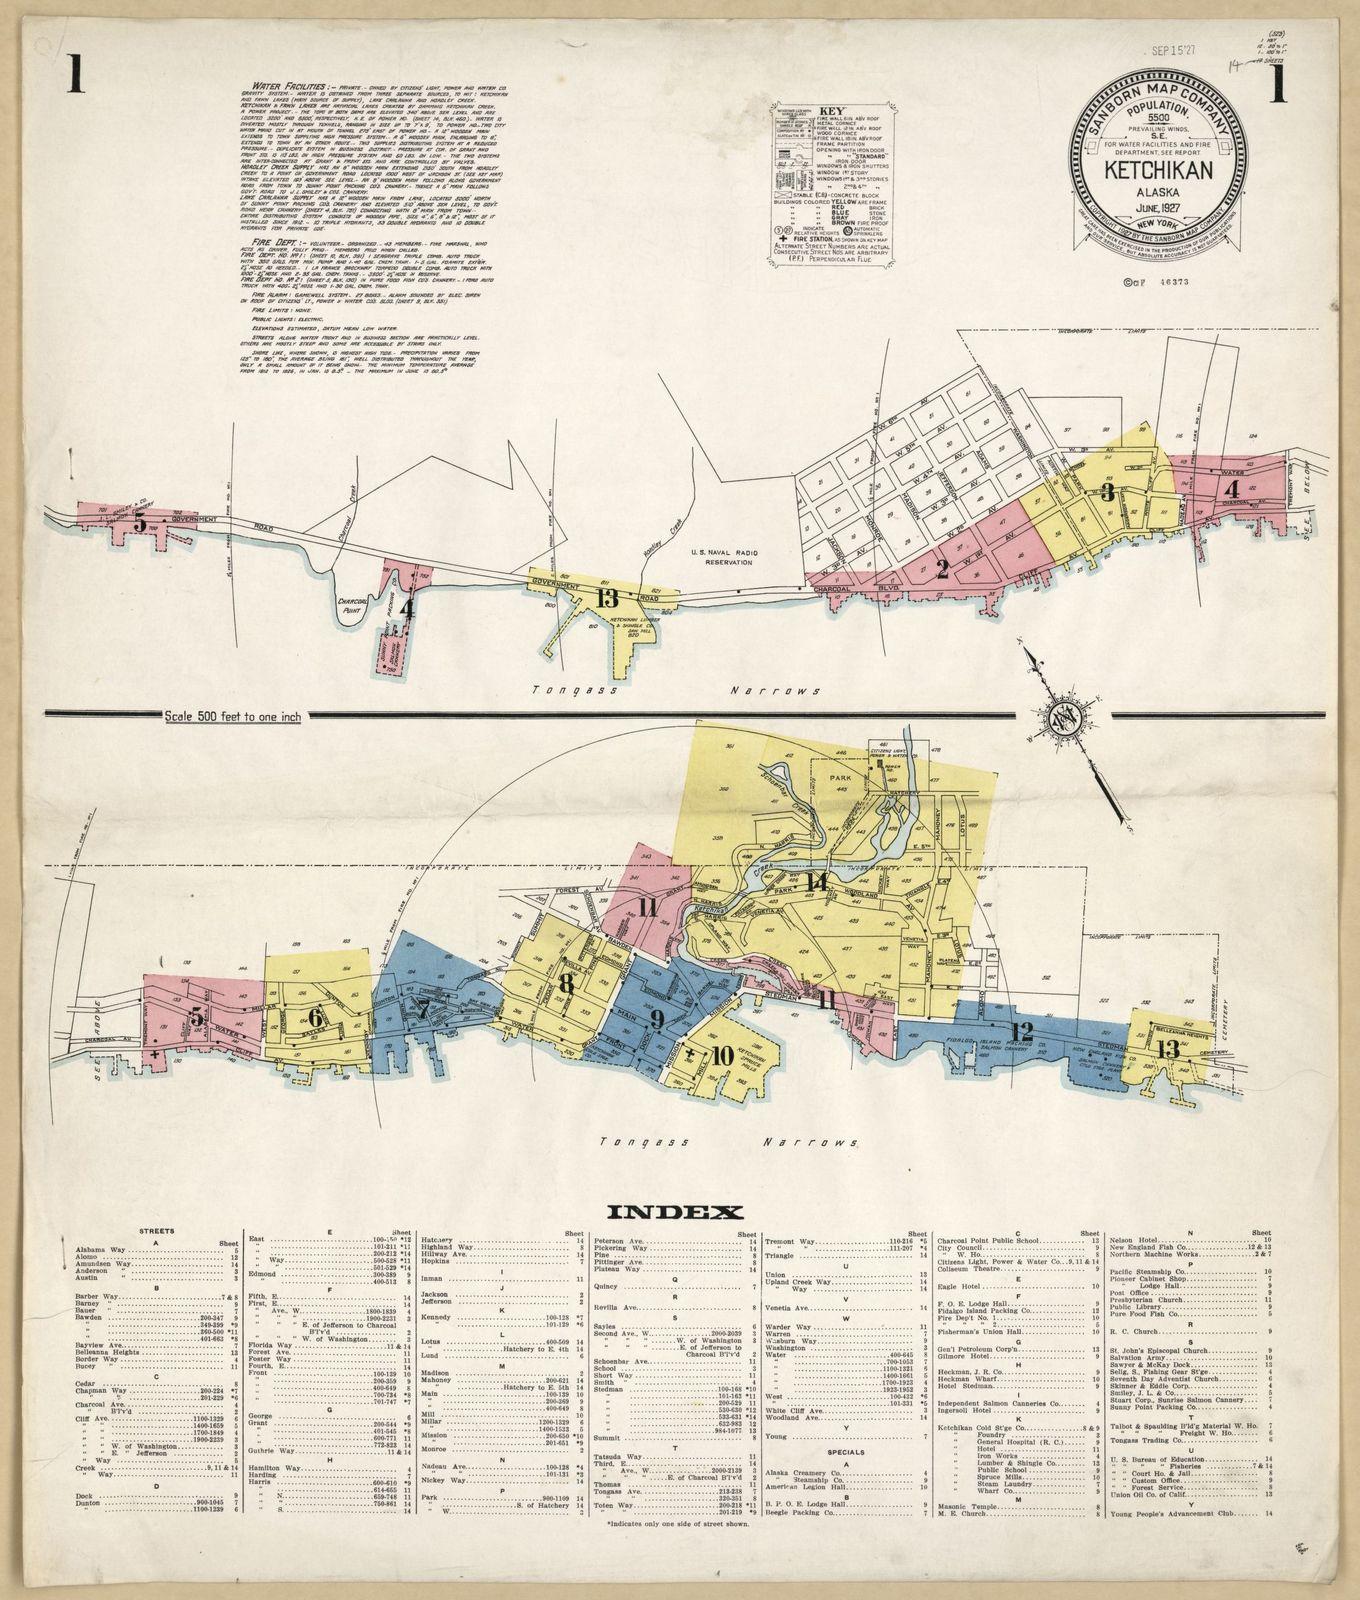 Sanborn Fire Insurance Map from Ketchikan, Ketchikan Census ... on sitka alaska, outline map of alaska, juneau alaska, map of homer alaska, large print map of alaska, map of wasilla alaska, map of southeast alaska, map of naknek alaska, juno alaska, ketchican alaska, skagway alaska, map of seward alaska, map of alaska inside passage, map of kotzebue alaska, map of craig alaska, map of alaska and canada, map of vancouver bc, road map of alaska, map of denali alaska, map of hoonah alaska,